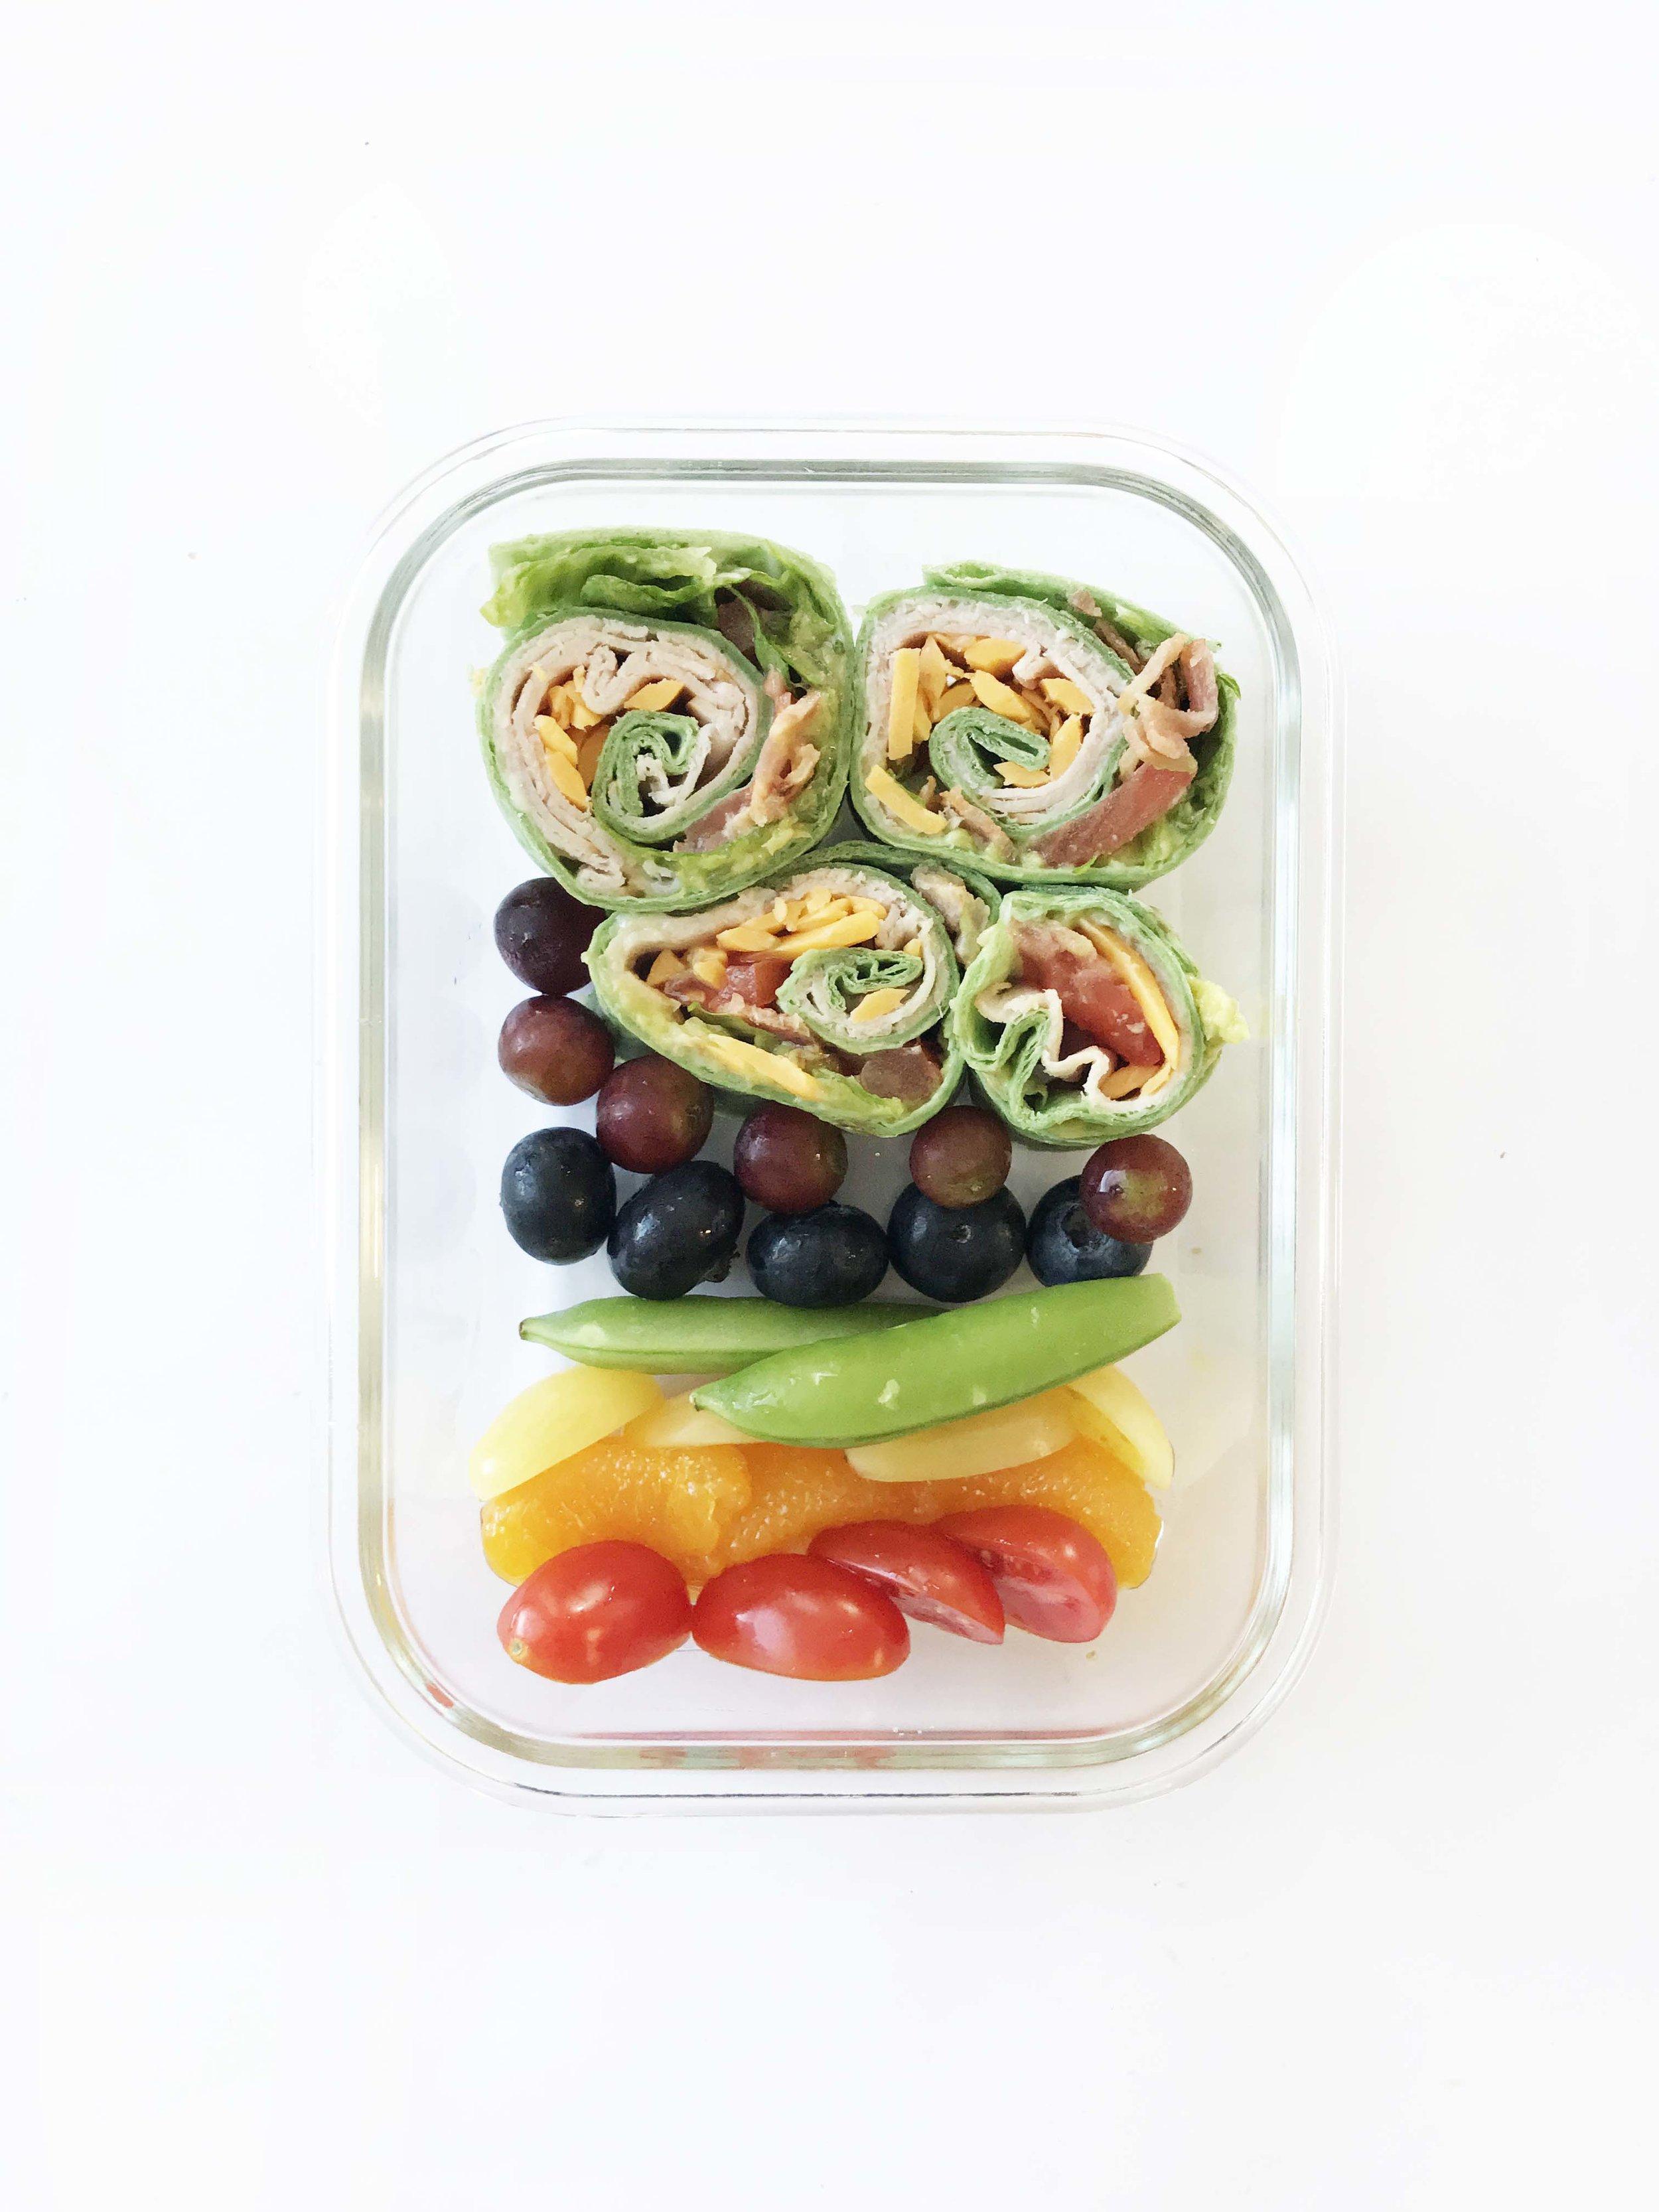 rainbow-wrap-lunch6.jpg